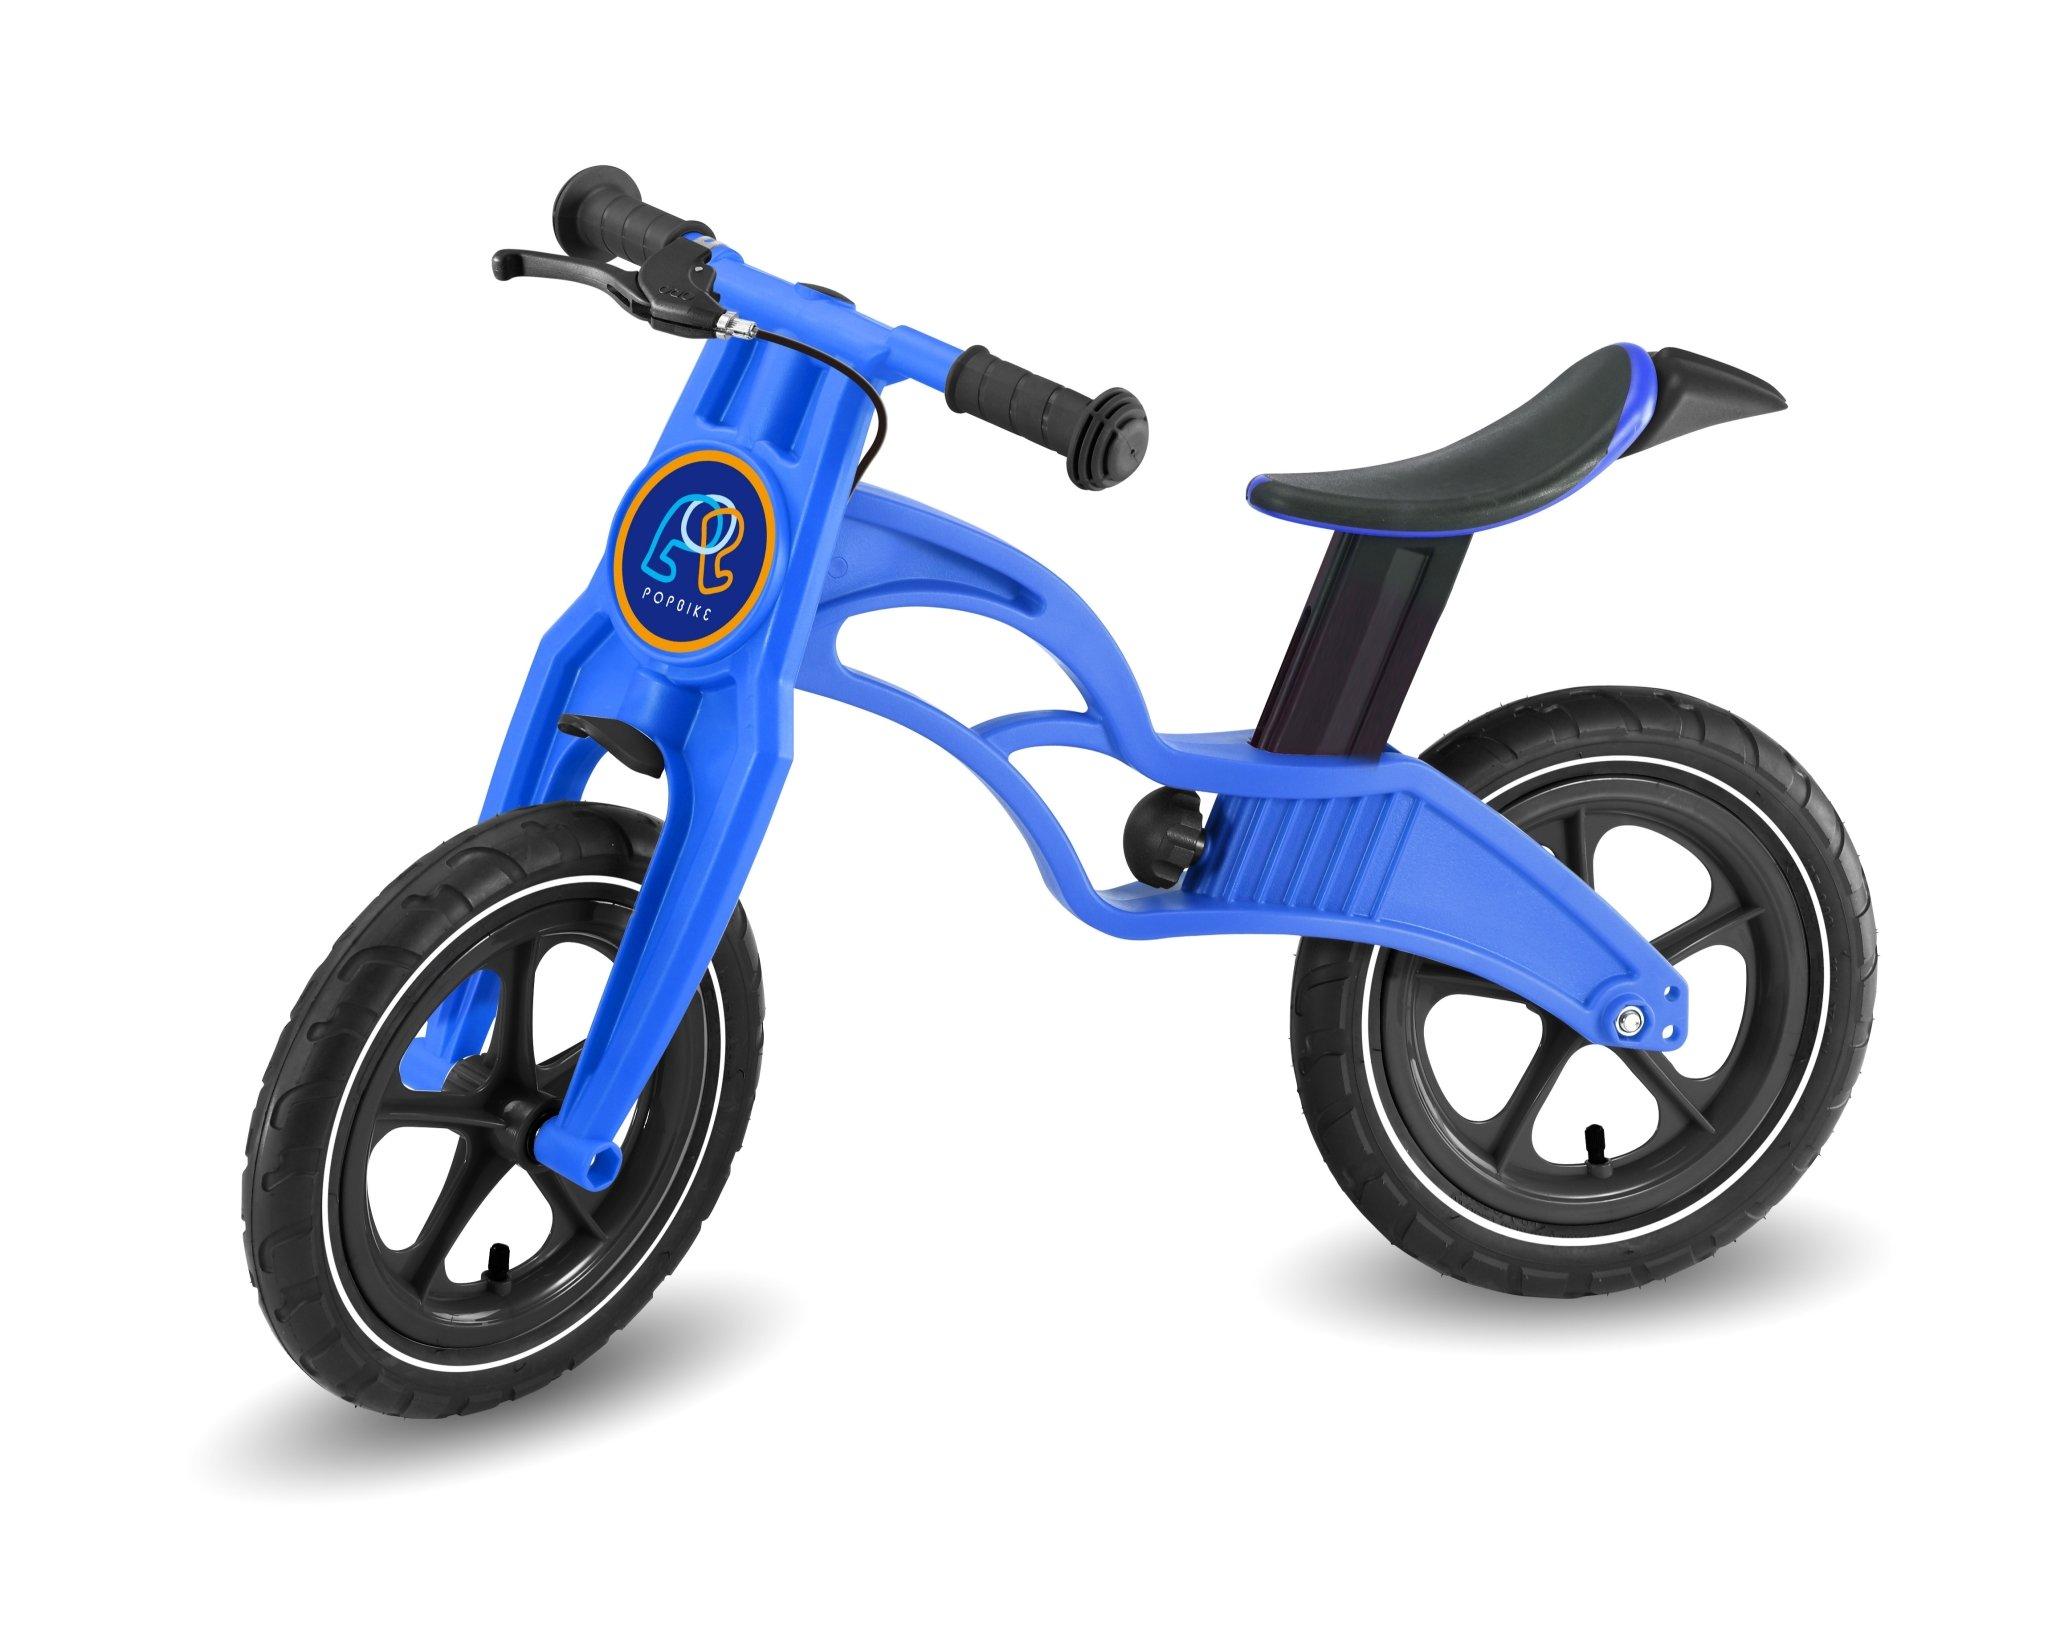 Pop Bike 兒童滑步車 / 平衡車 / 學步車 /  - 煞車版 氣胎 藍色 - 限時優惠好康折扣